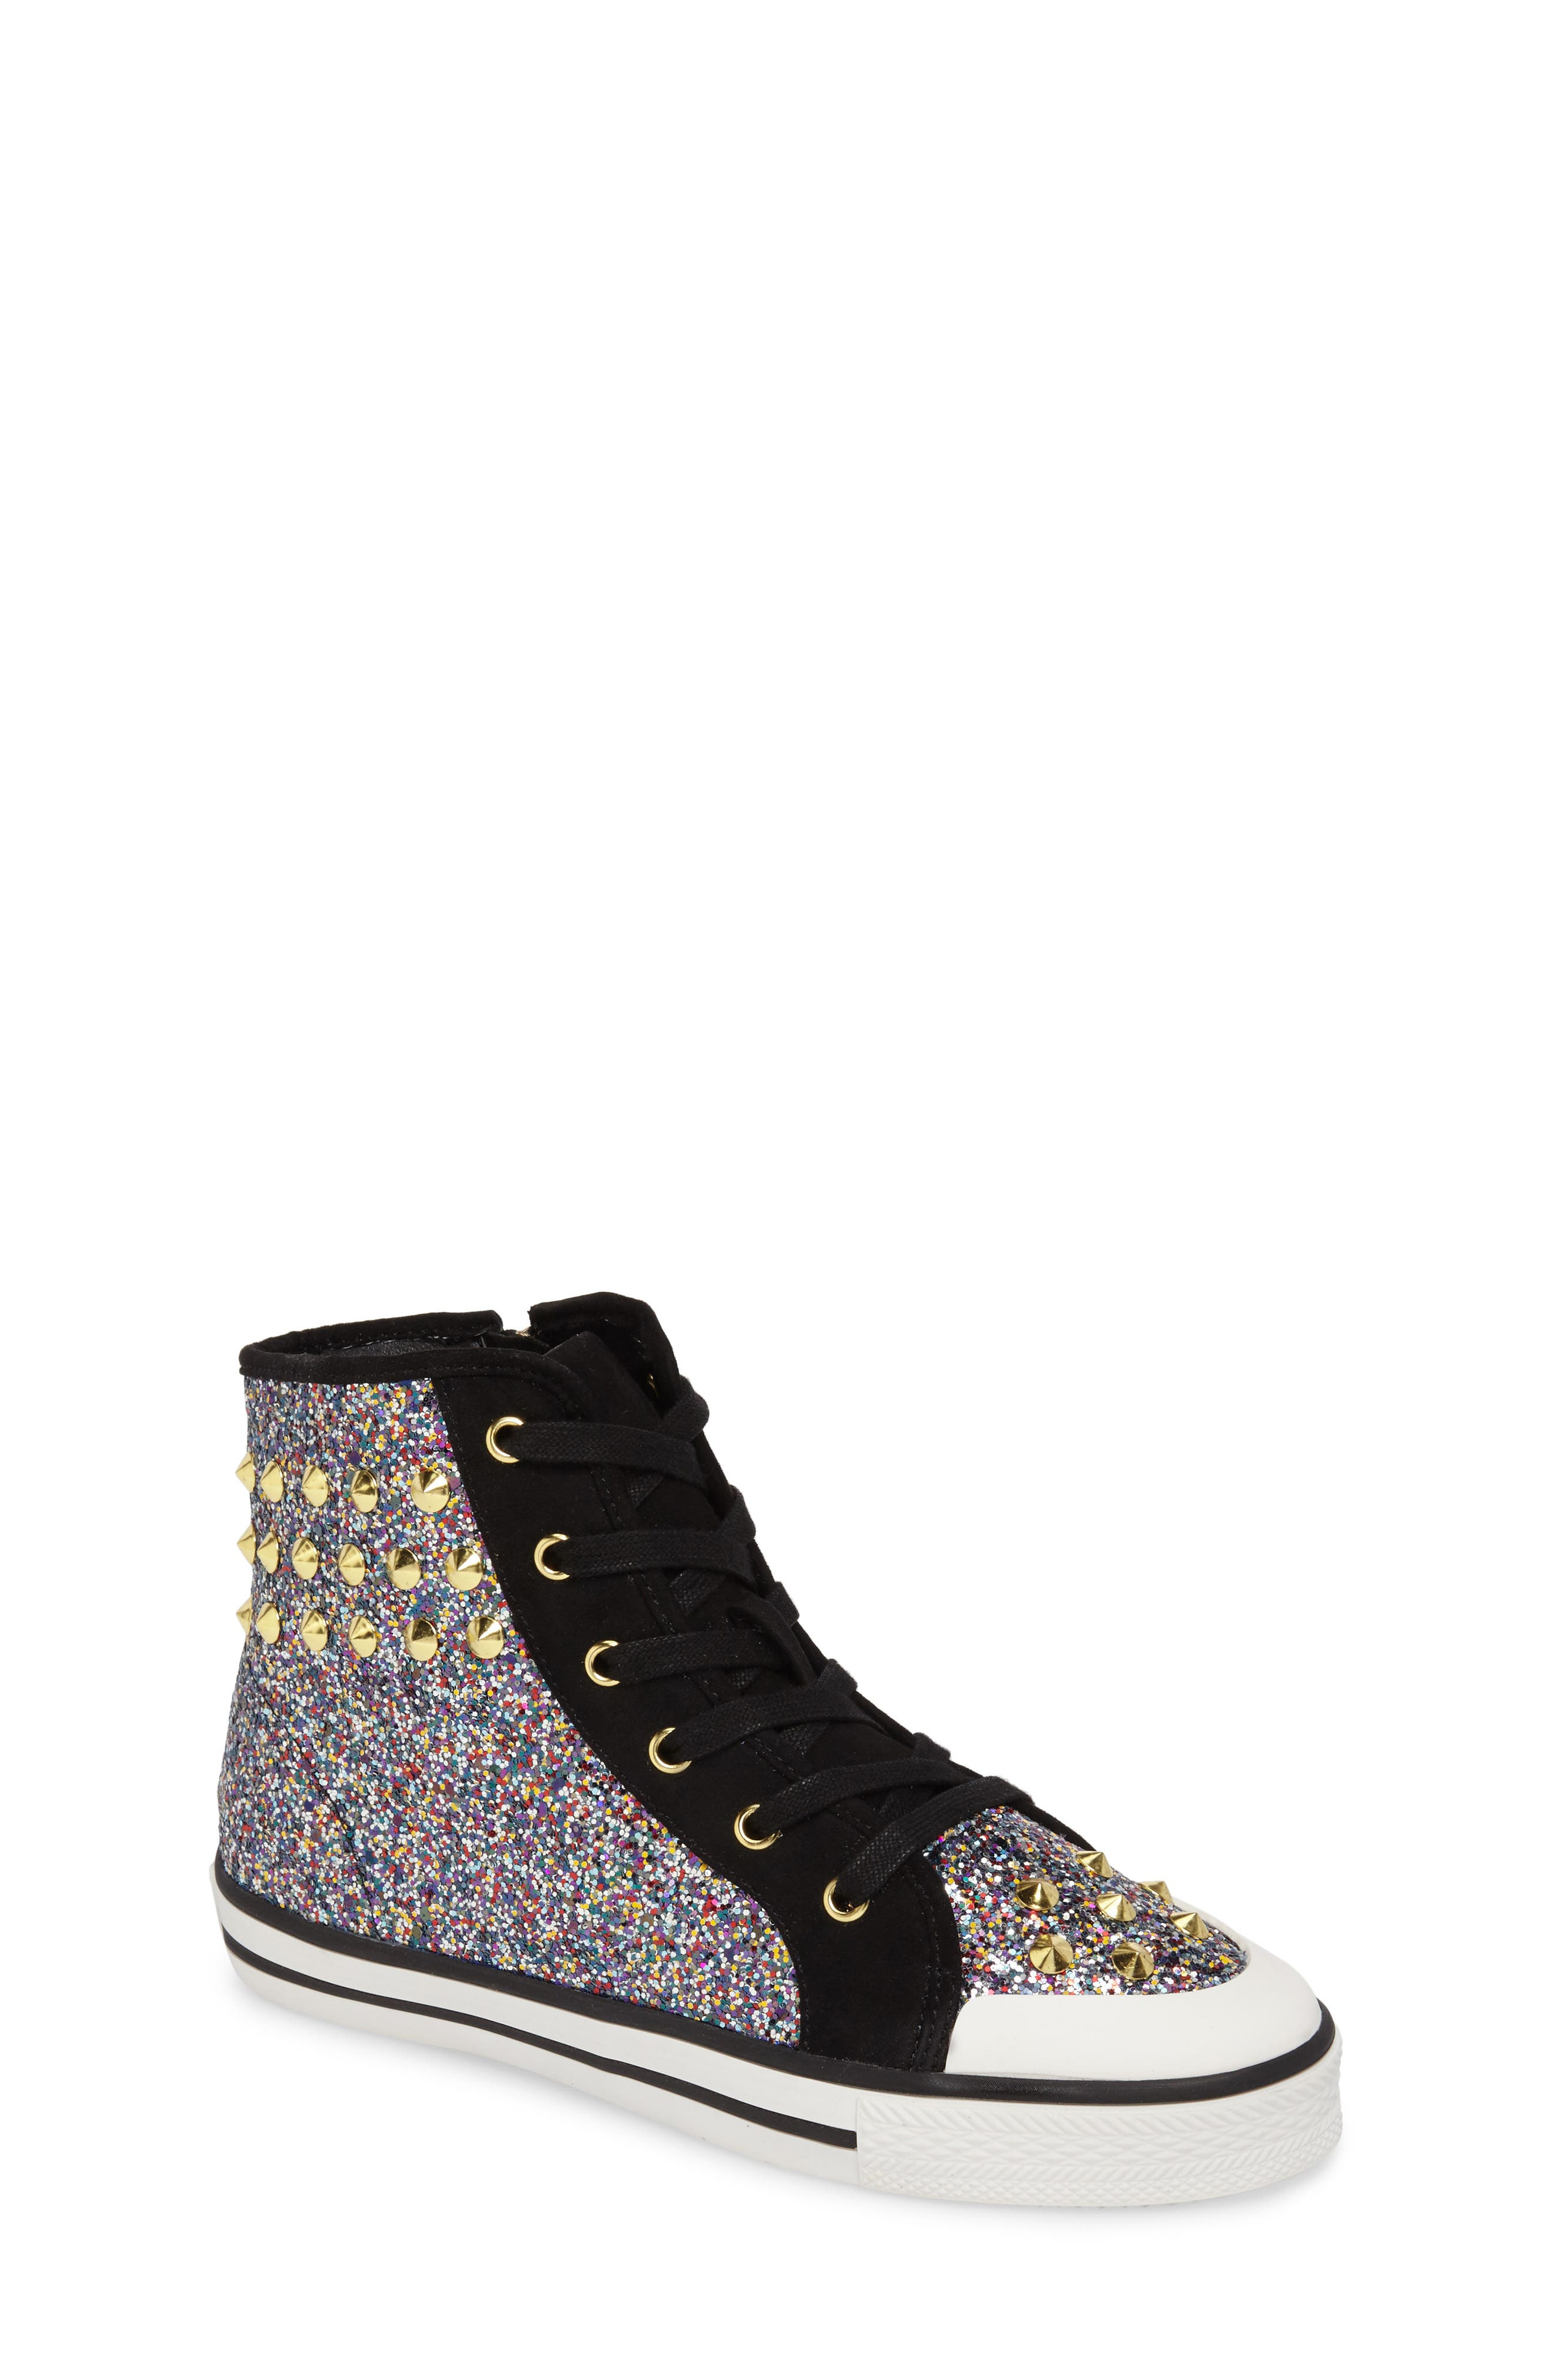 Lita Roe Glittery High Top Sneaker,                             Main thumbnail 1, color,                             003